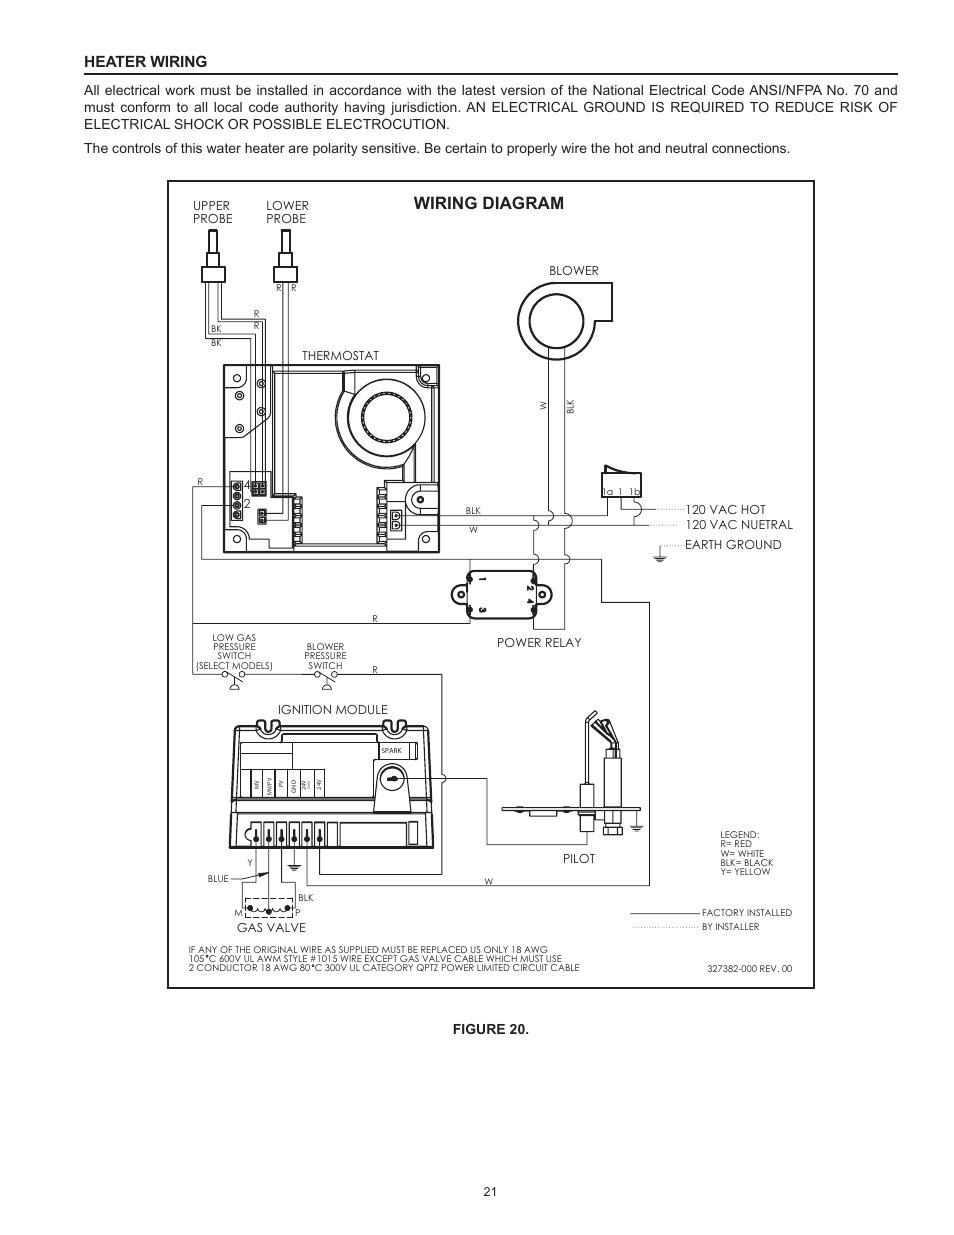 Wiring Diagram  Heater Wiring  Figure 20